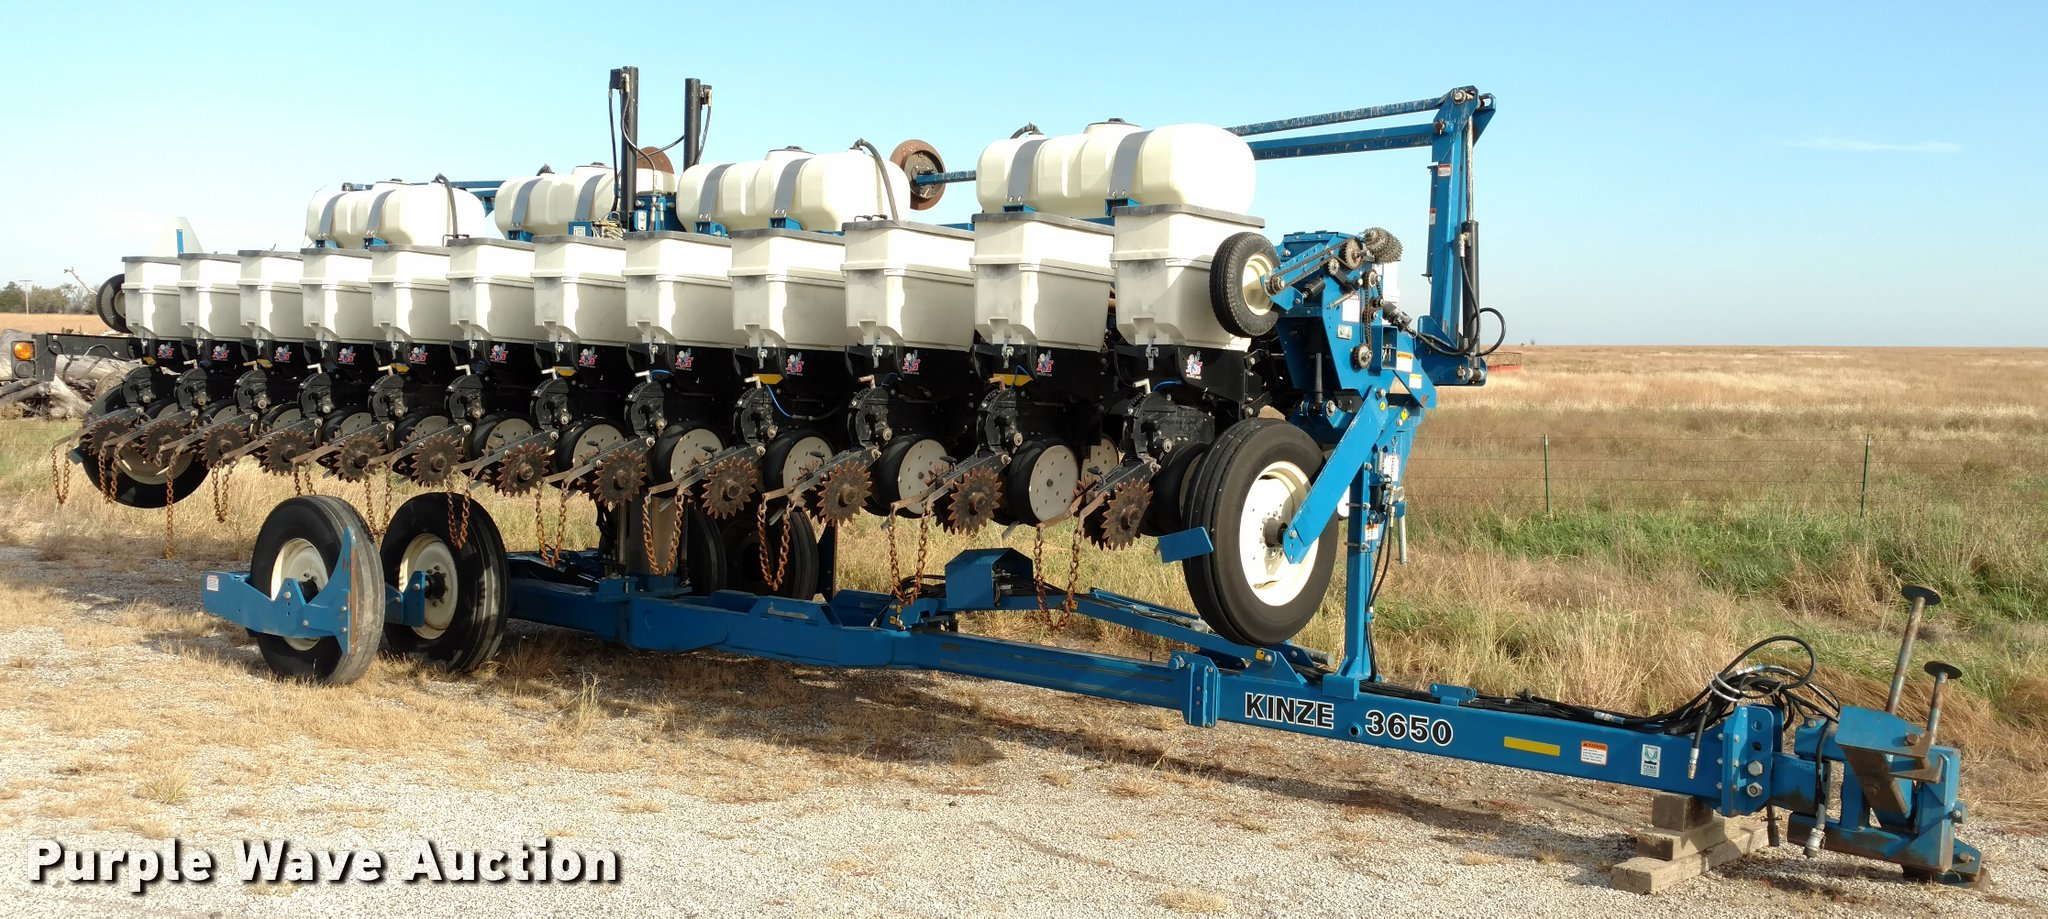 Kinze 3650 12 23 Interplant Split Row Planter Item Da4337